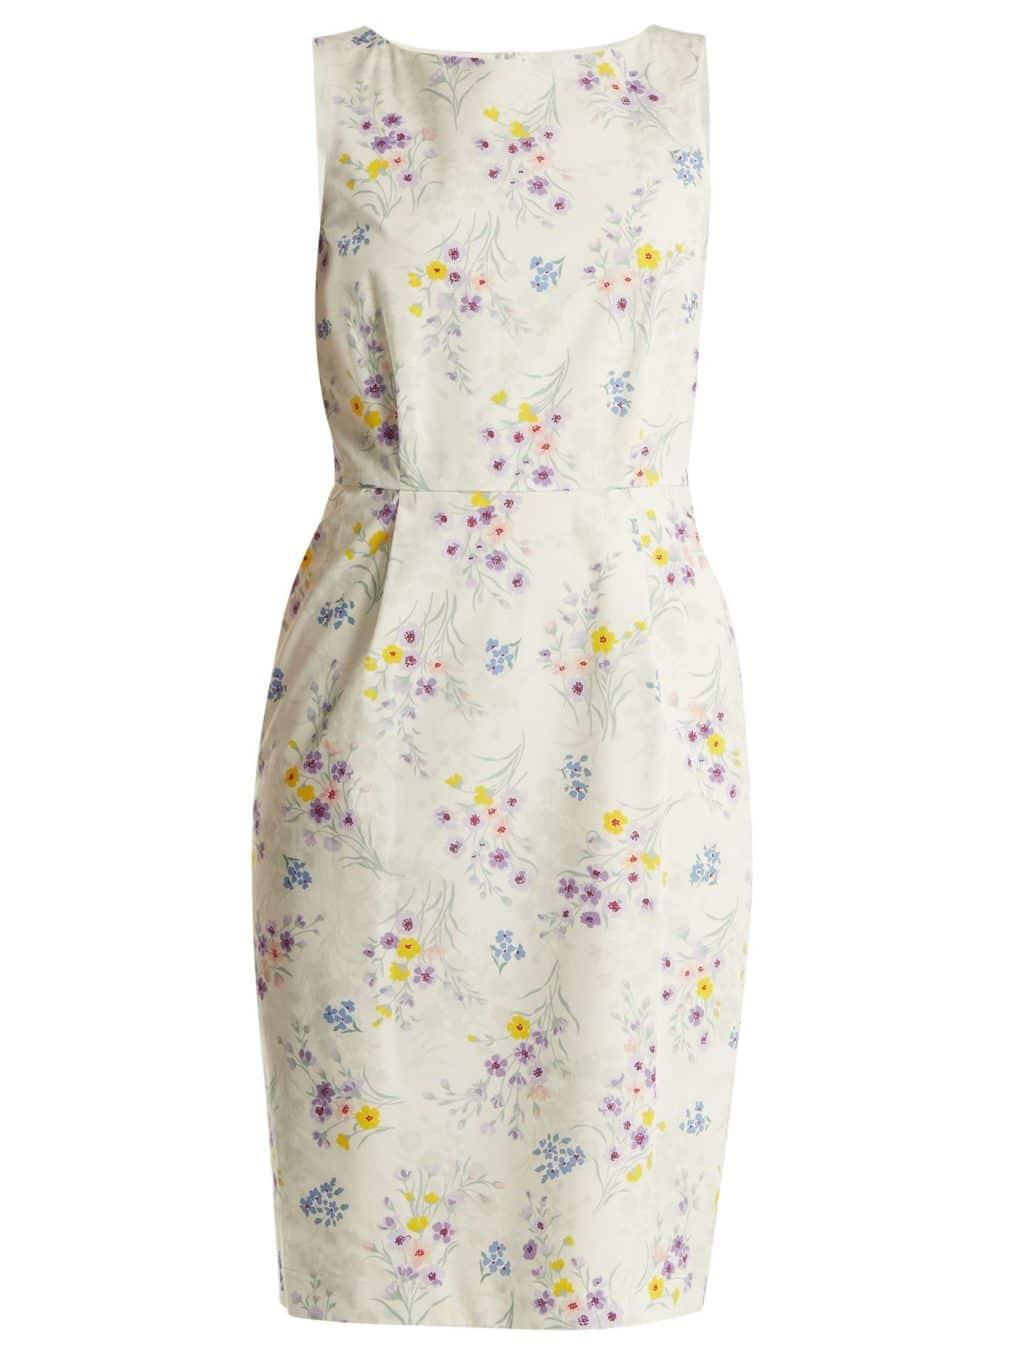 8076be6b427 MAX MARA Melfi White Dress - We Select Dresses